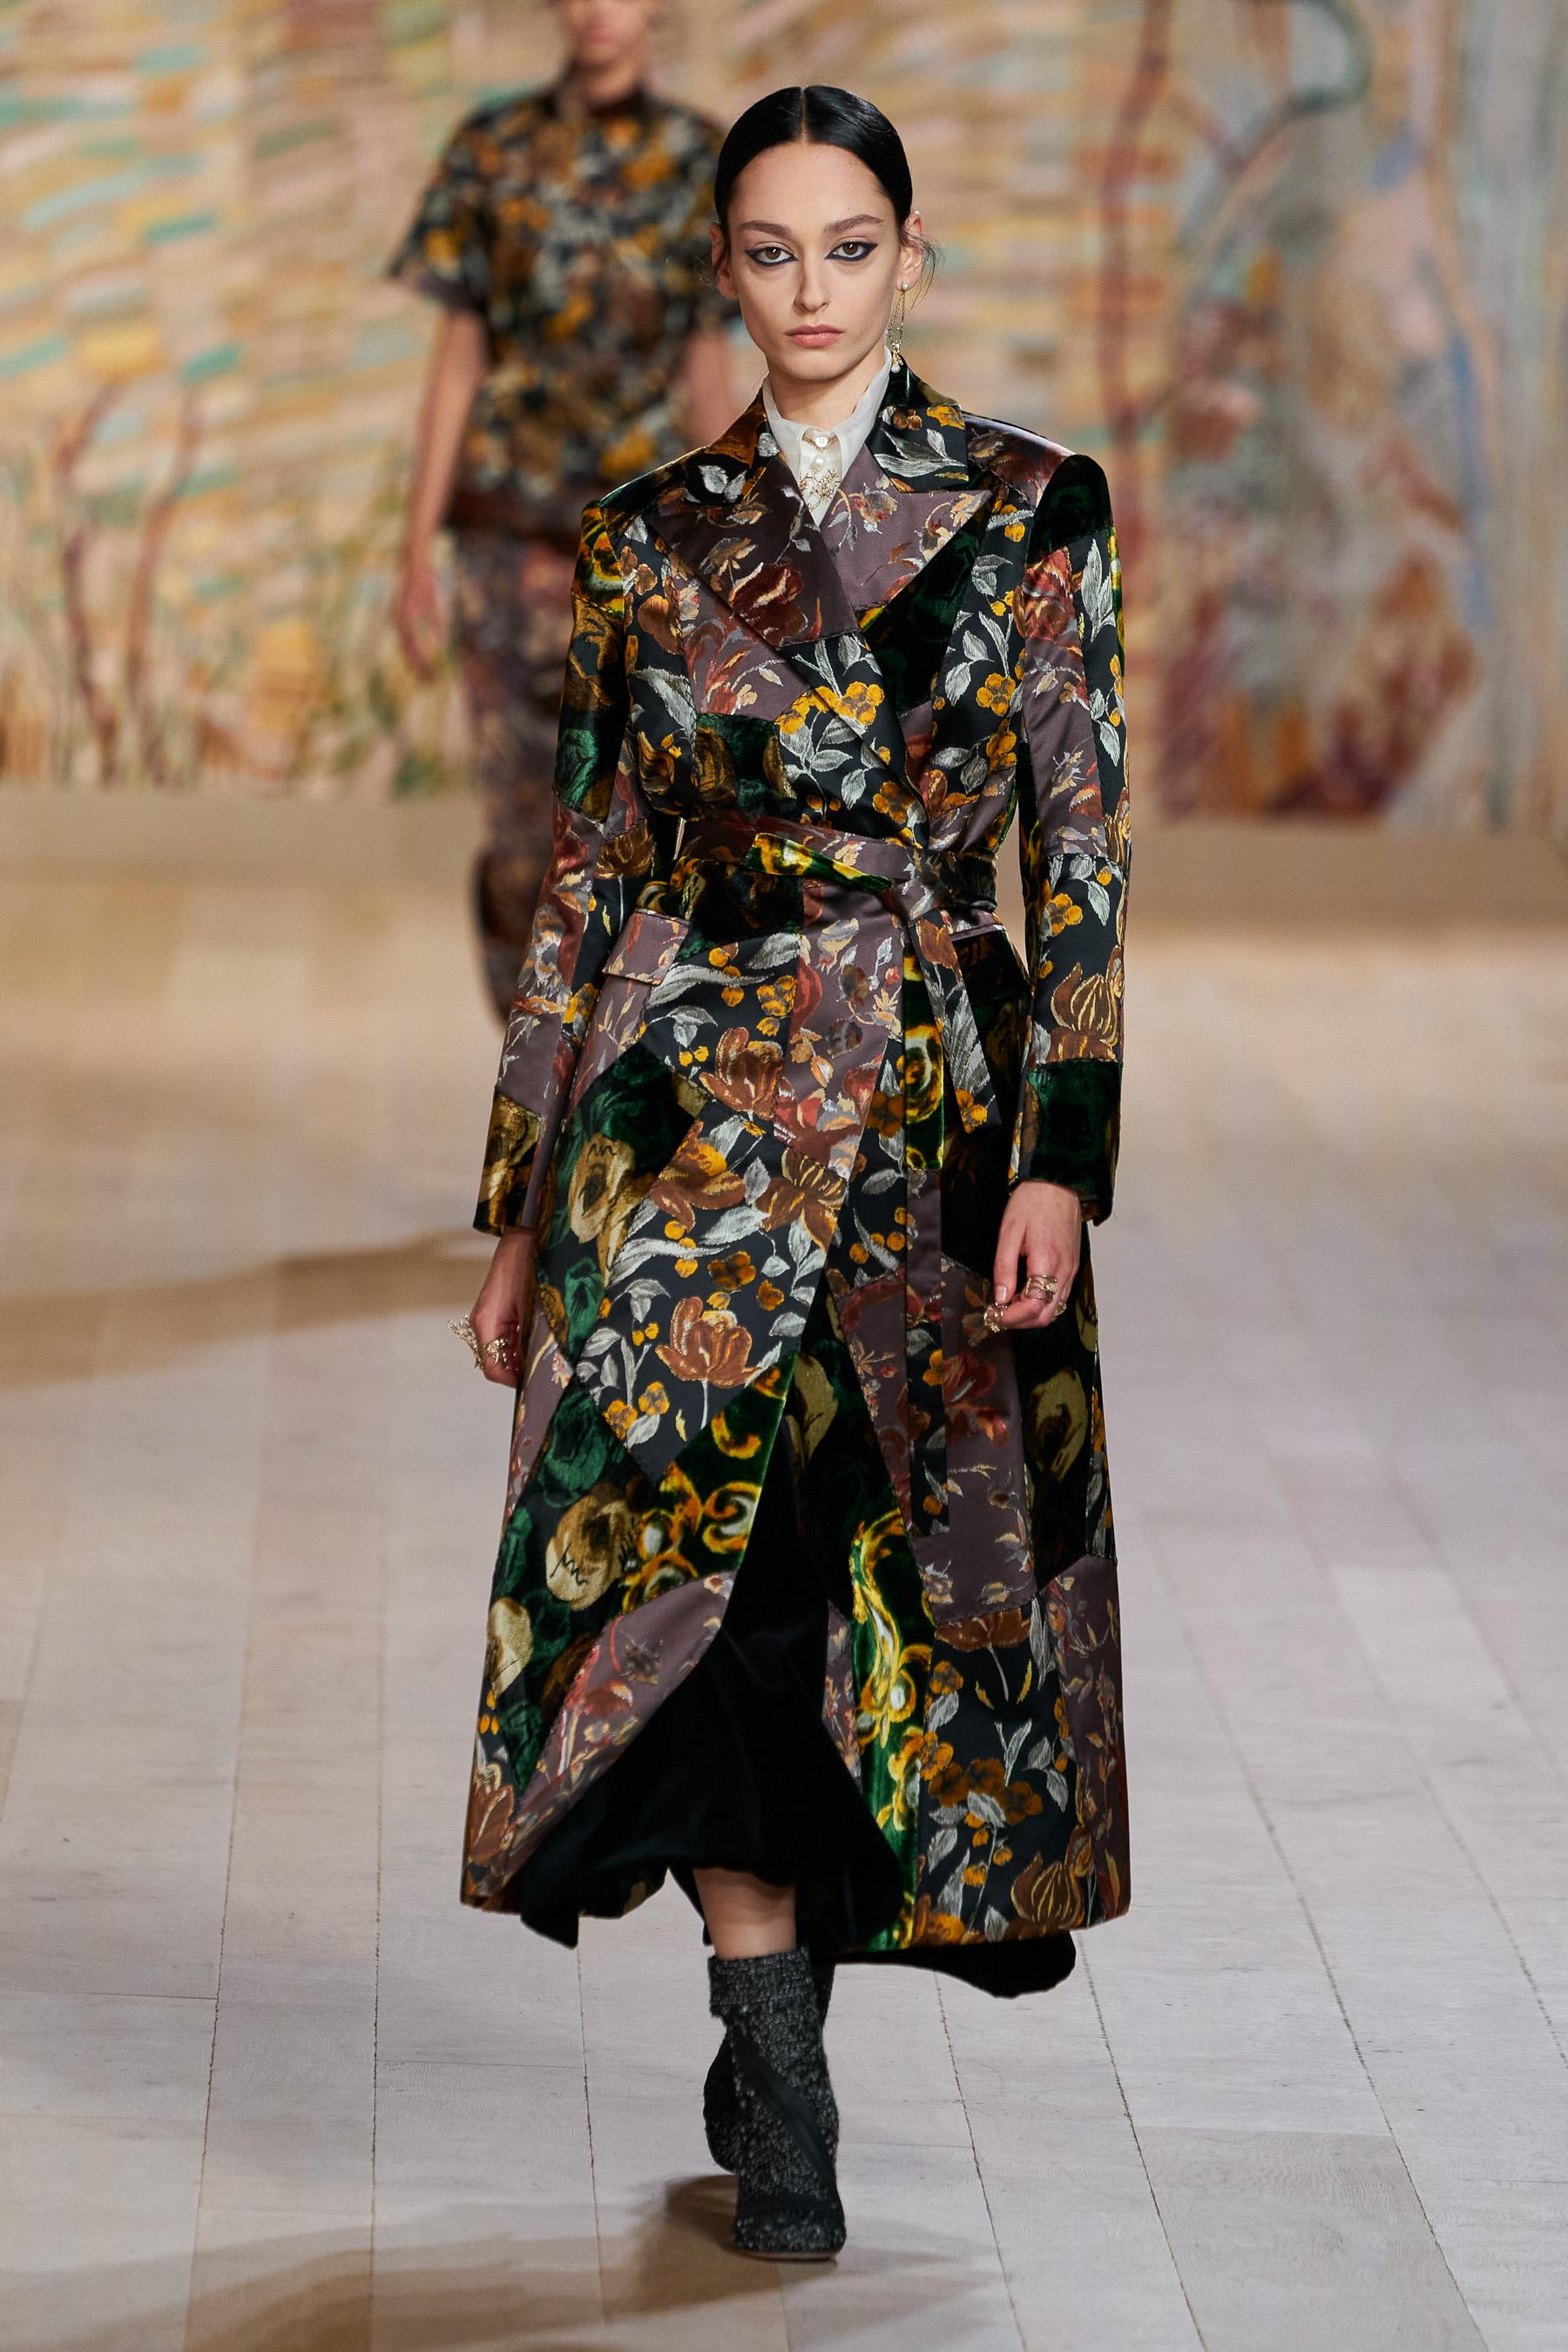 Christian Dior Fall 2021 Couture  Fashion Show